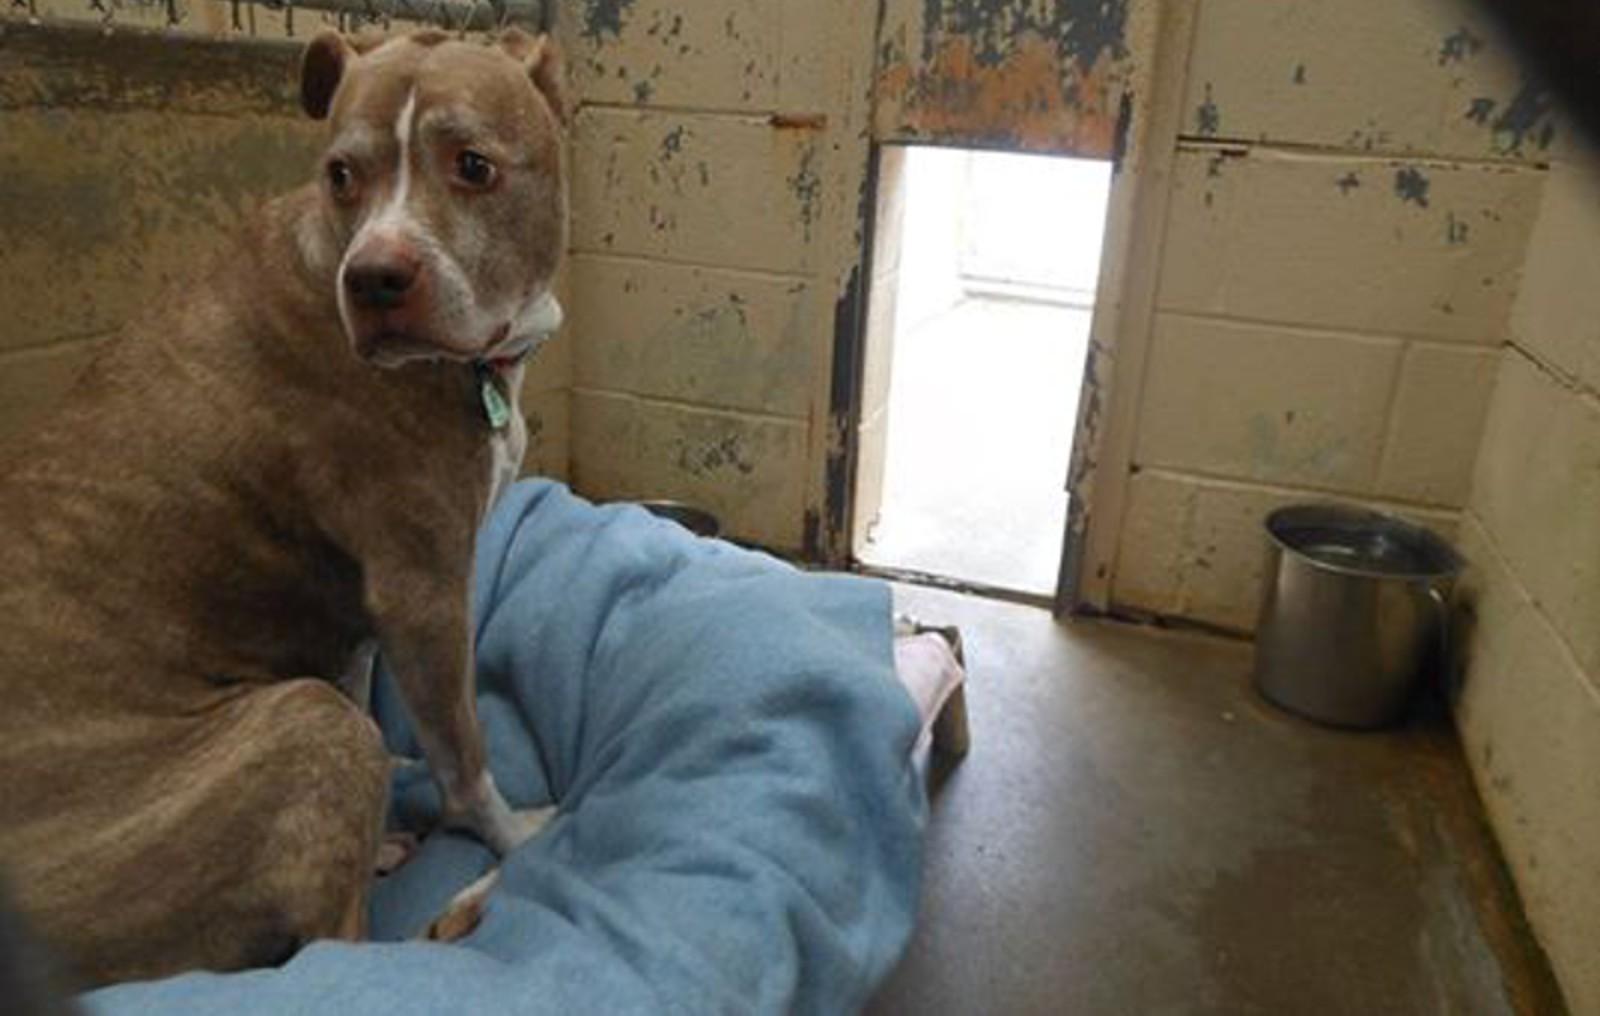 Senior Dog Left Homeless After Her Family Remodeled Their House – Help Her Find the Loving Home She Deserves!